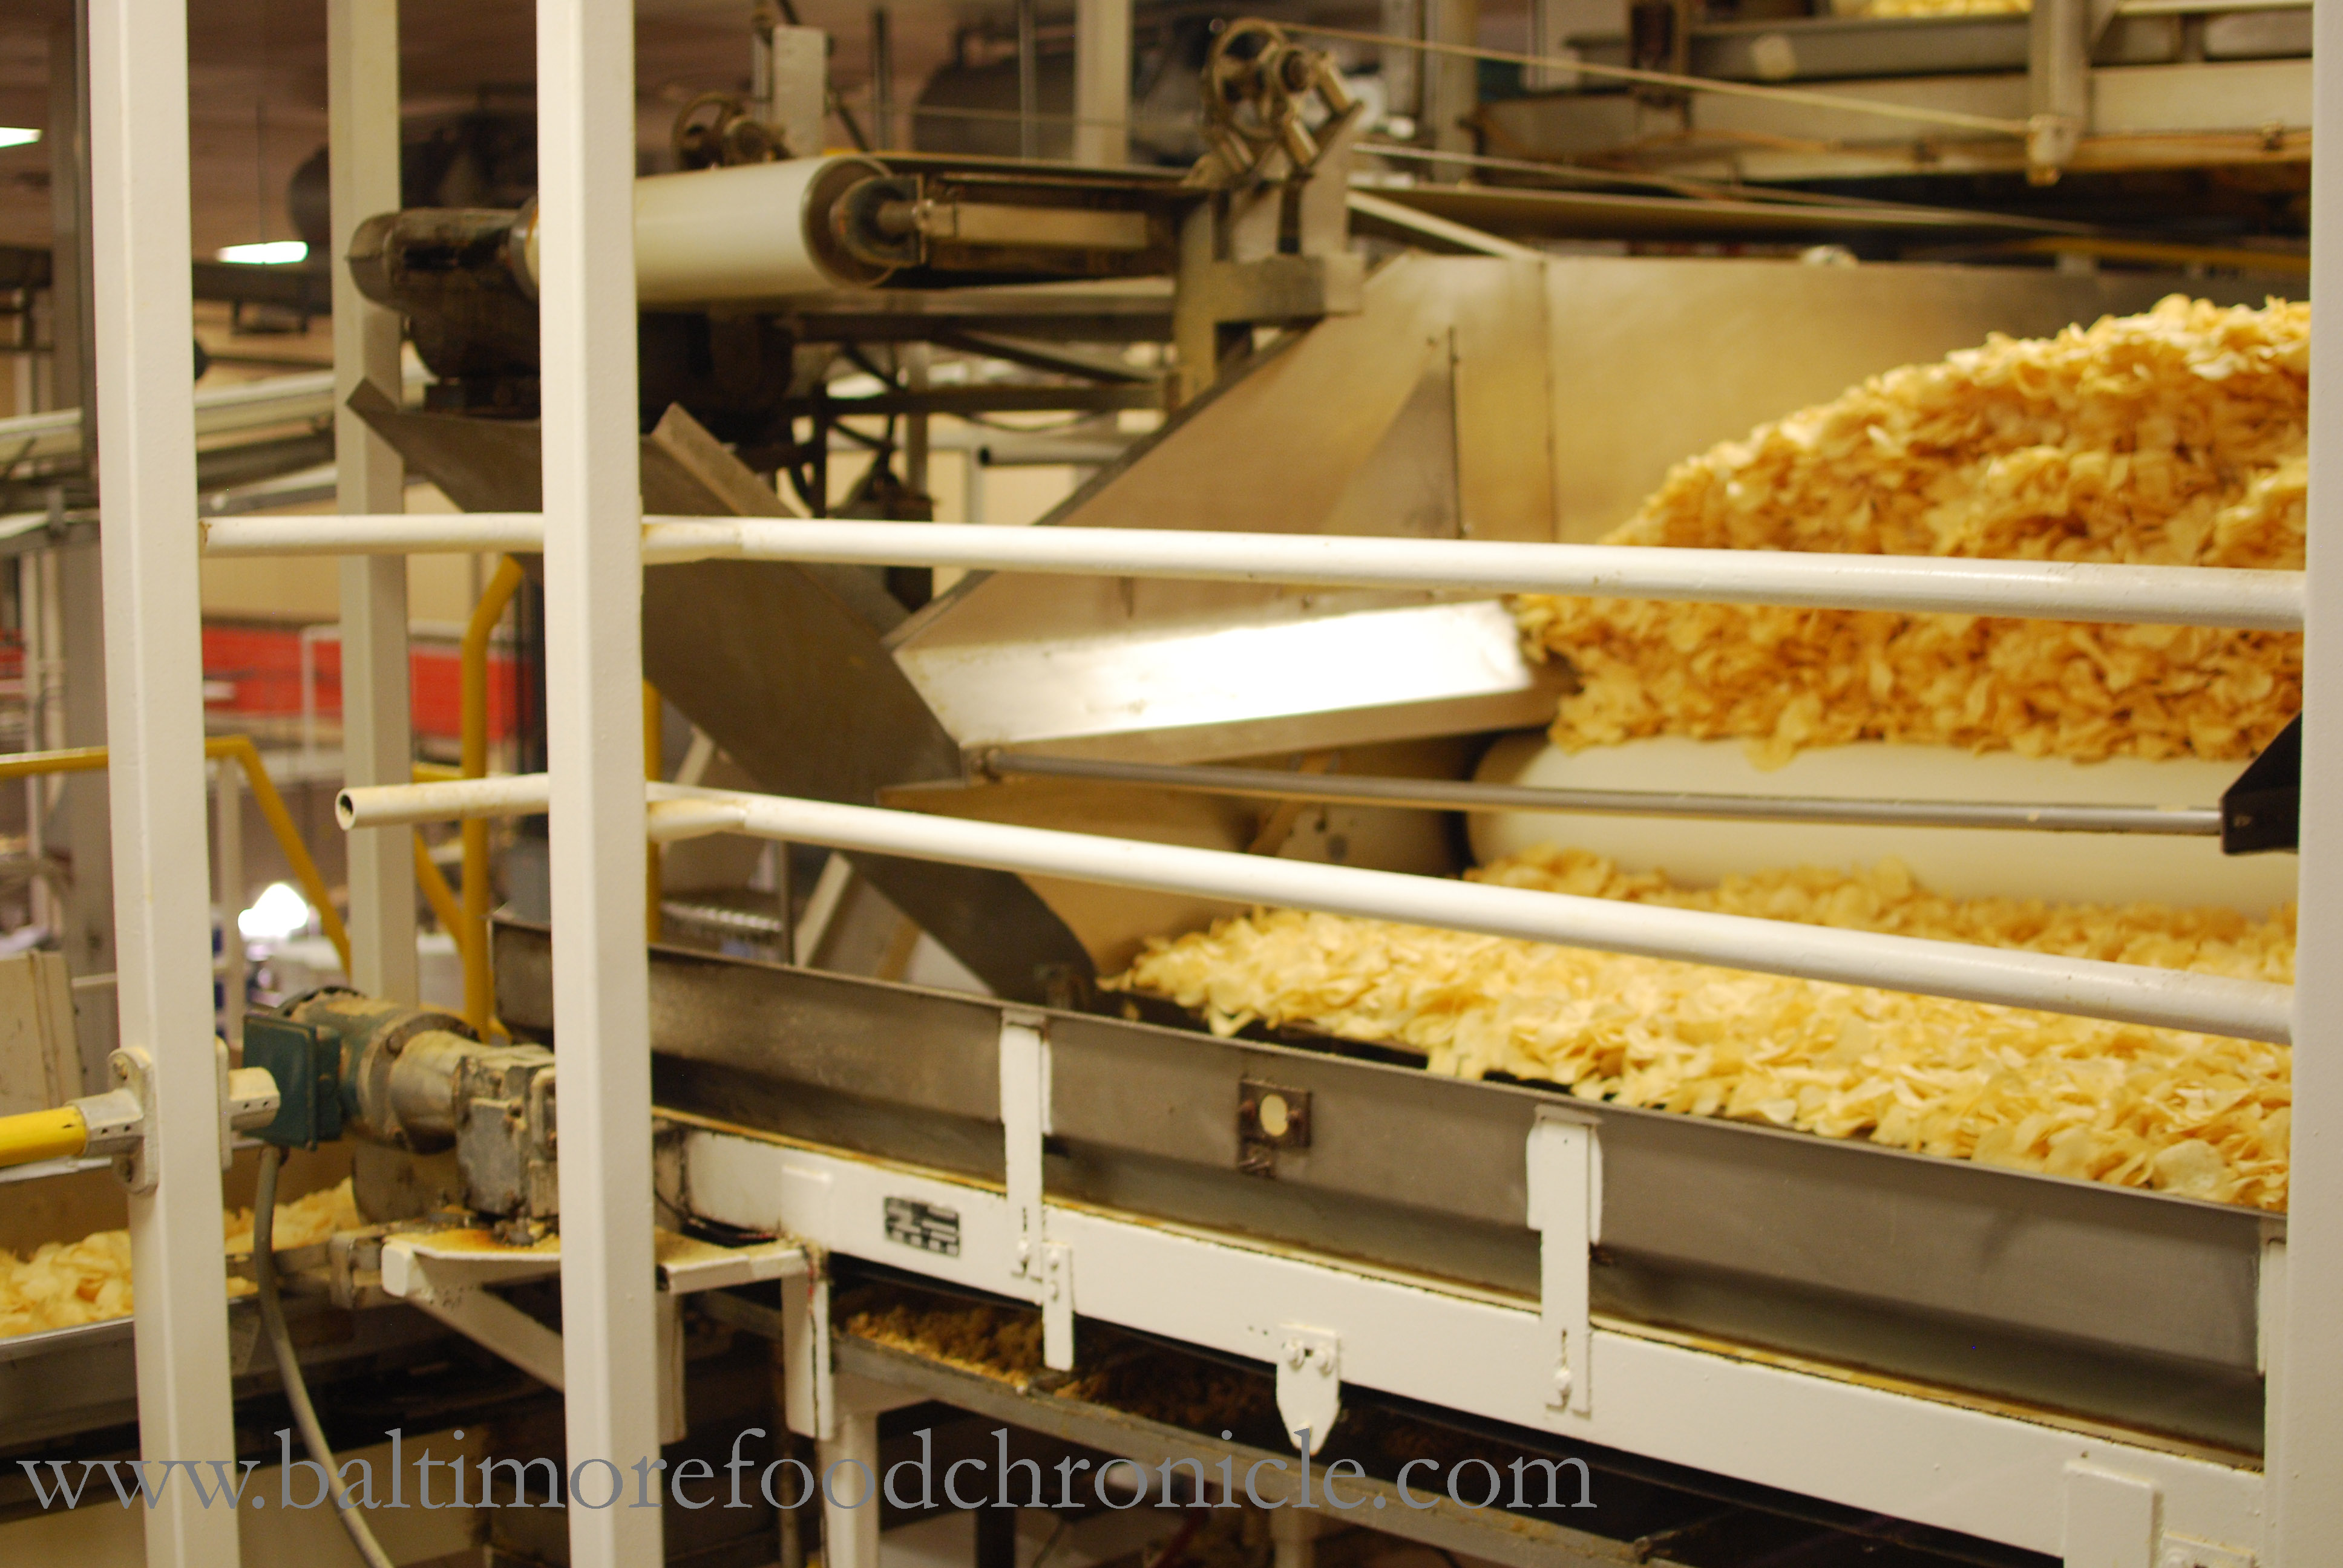 Utz Potato Chips Baltimore Food Chronicle